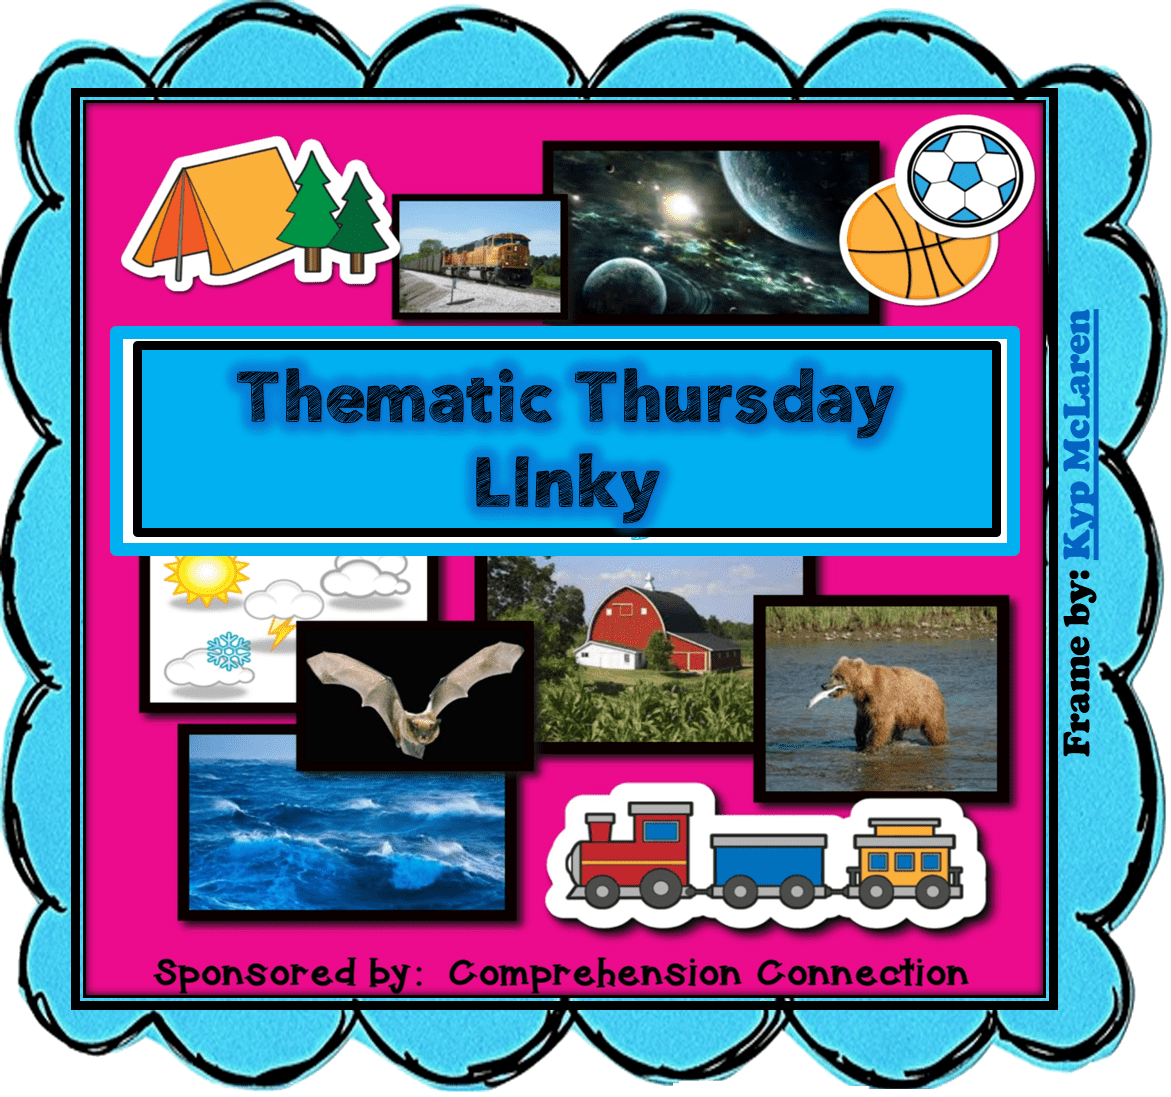 thematic2bthursday2blinky-4924640